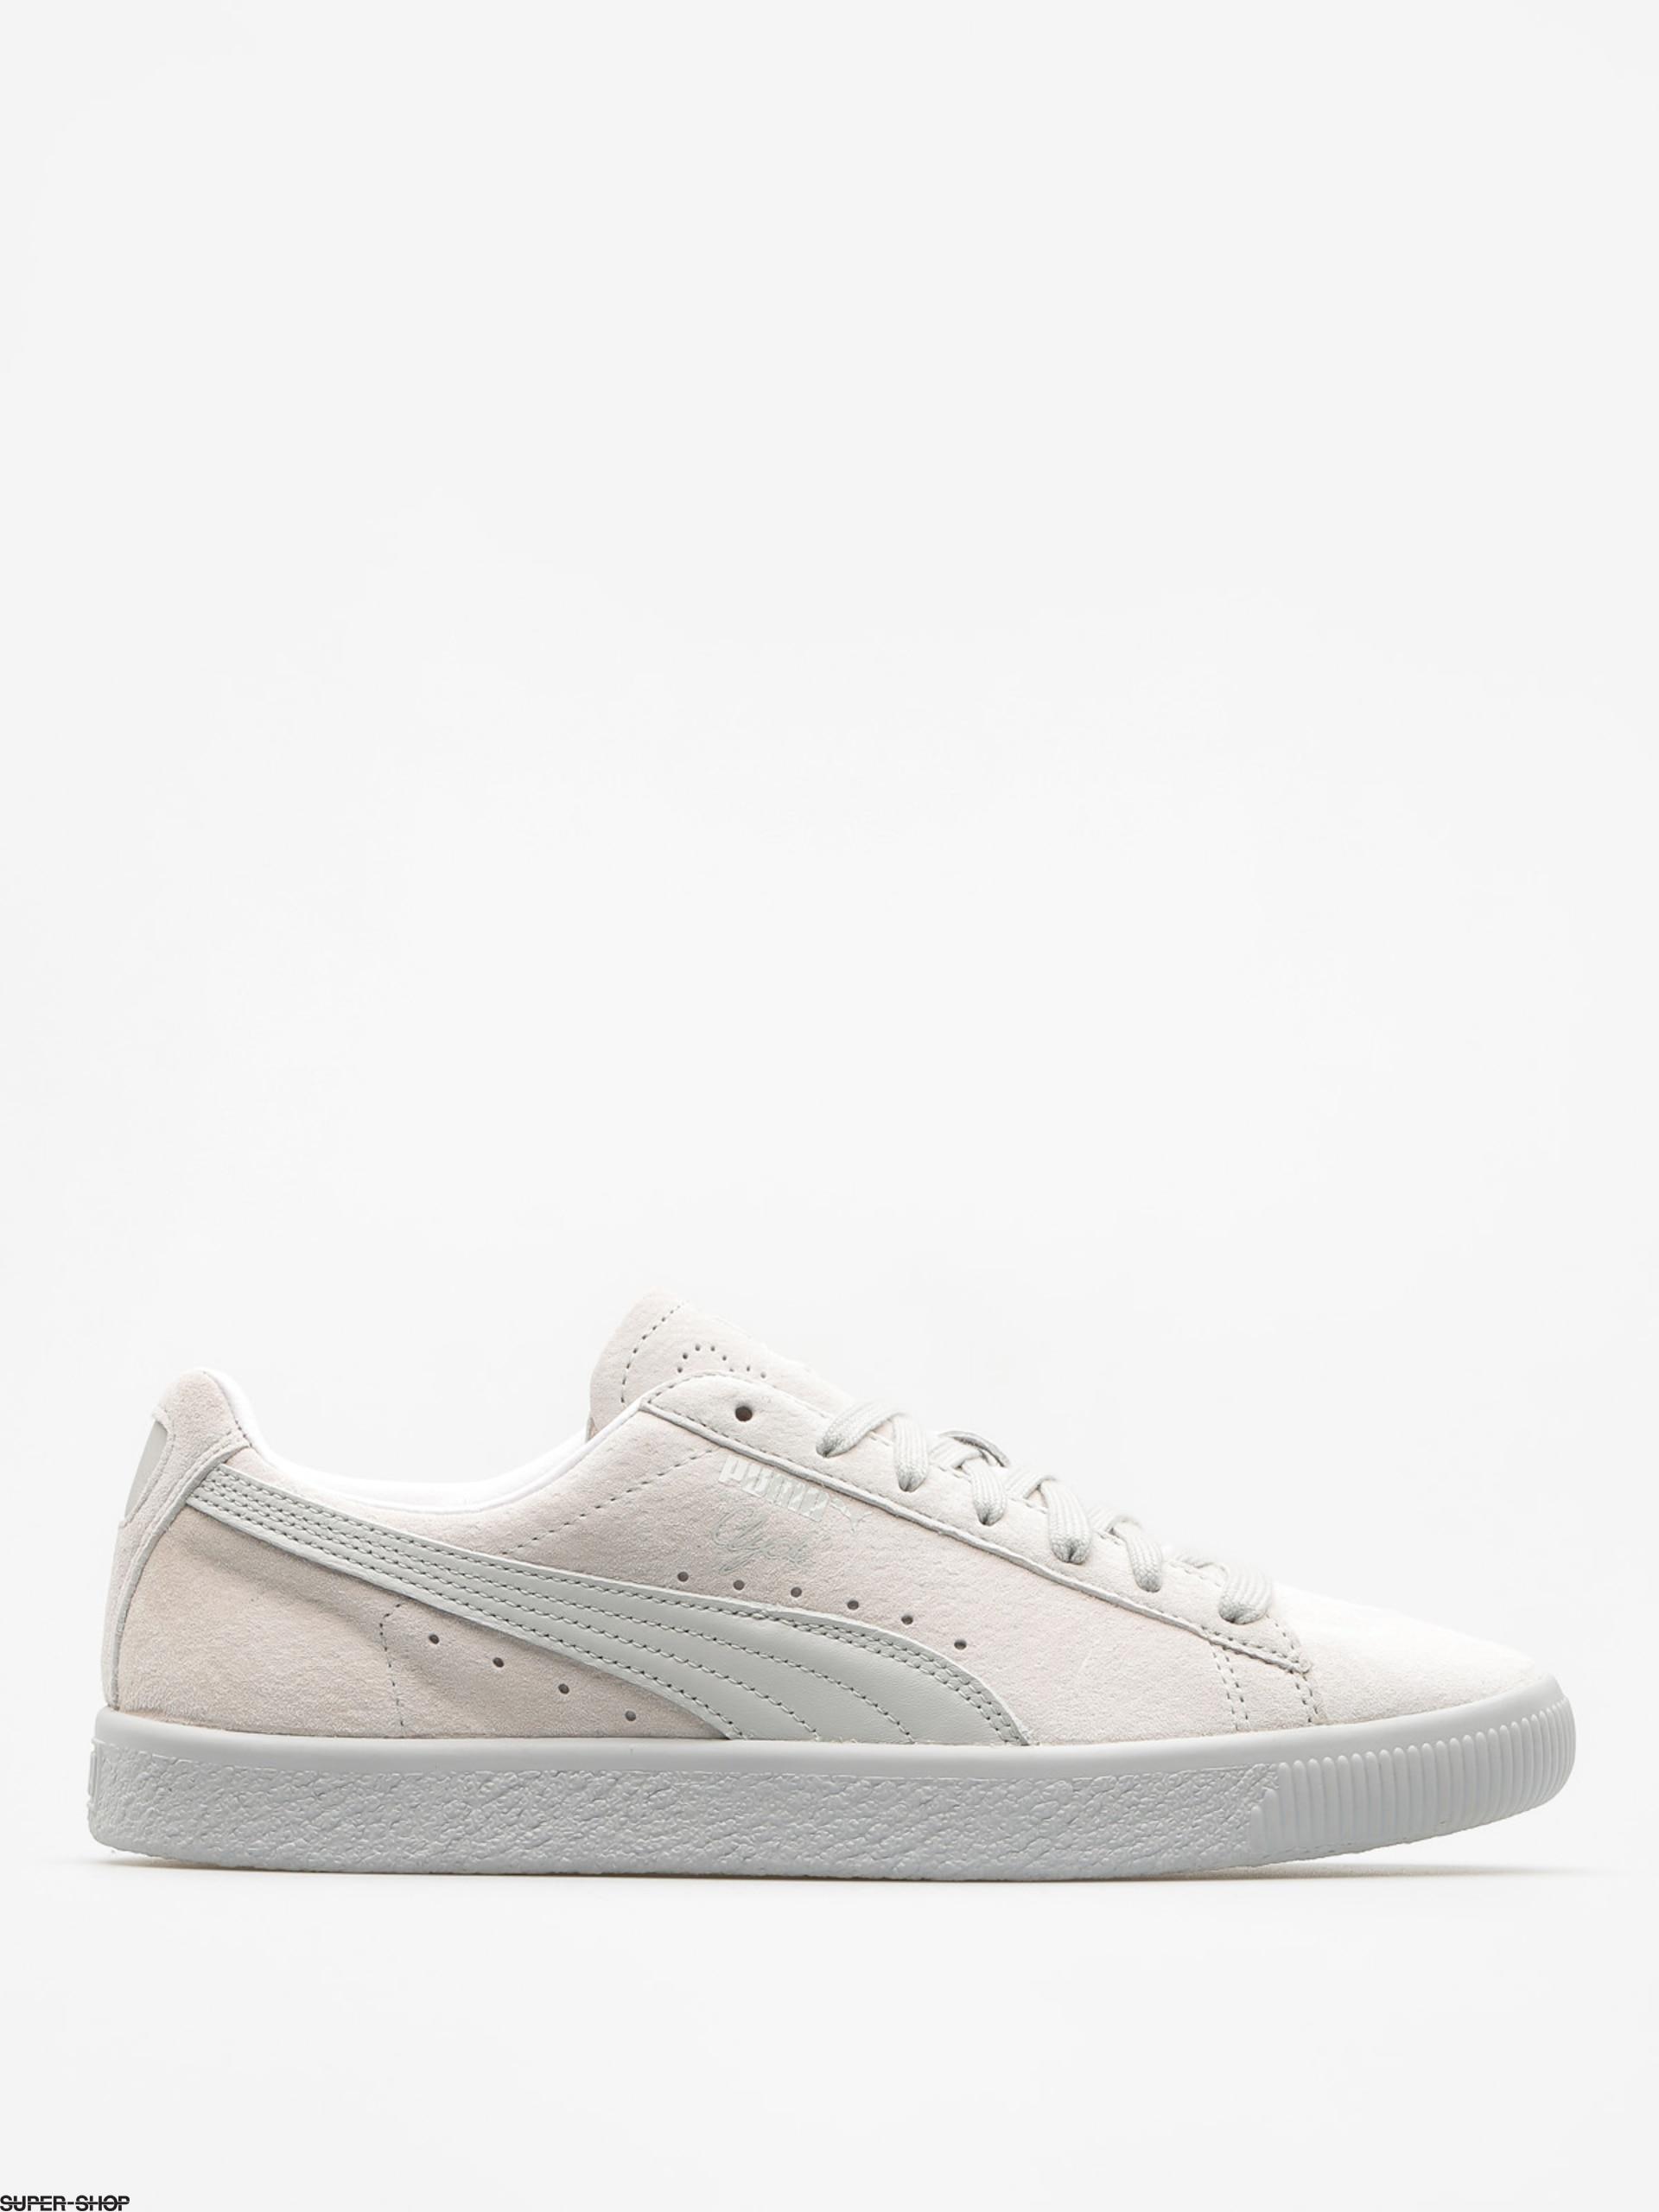 Puma Shoes Clyde Normcore (gray violet gray violet) c7465a11a